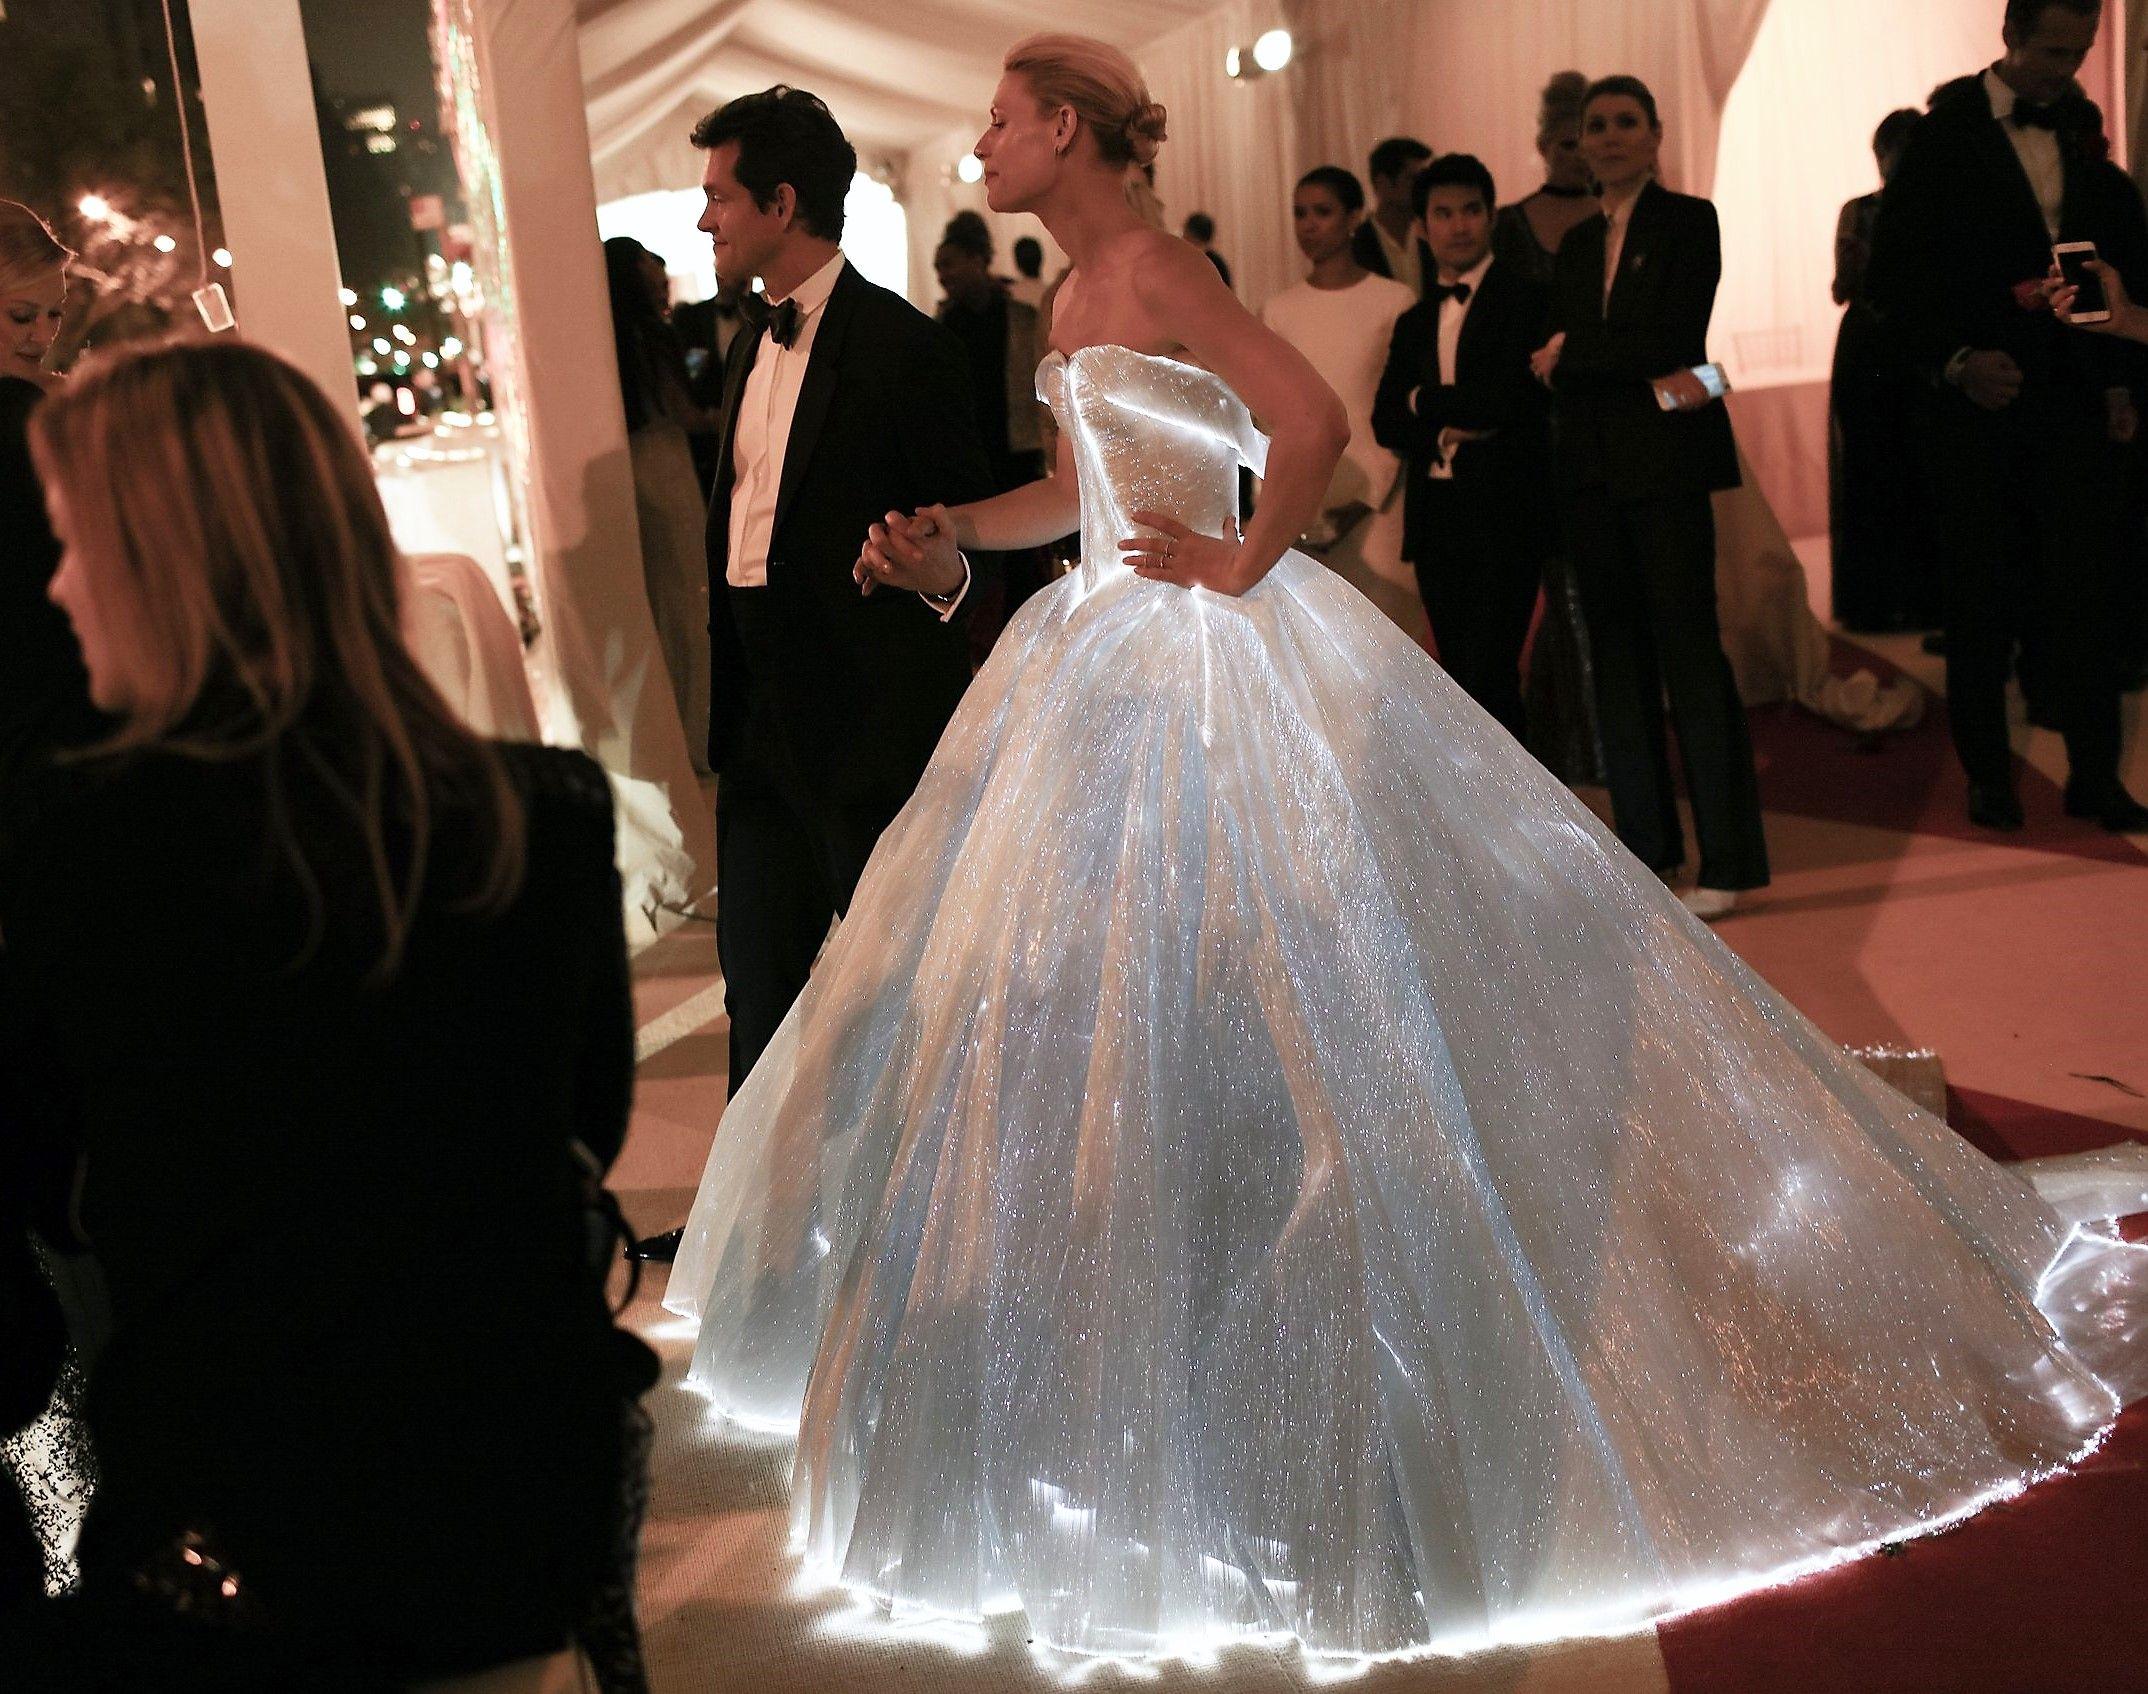 Light up wedding dress  djsdurban  Fiber Optic  Pinterest  Fiber optic dress